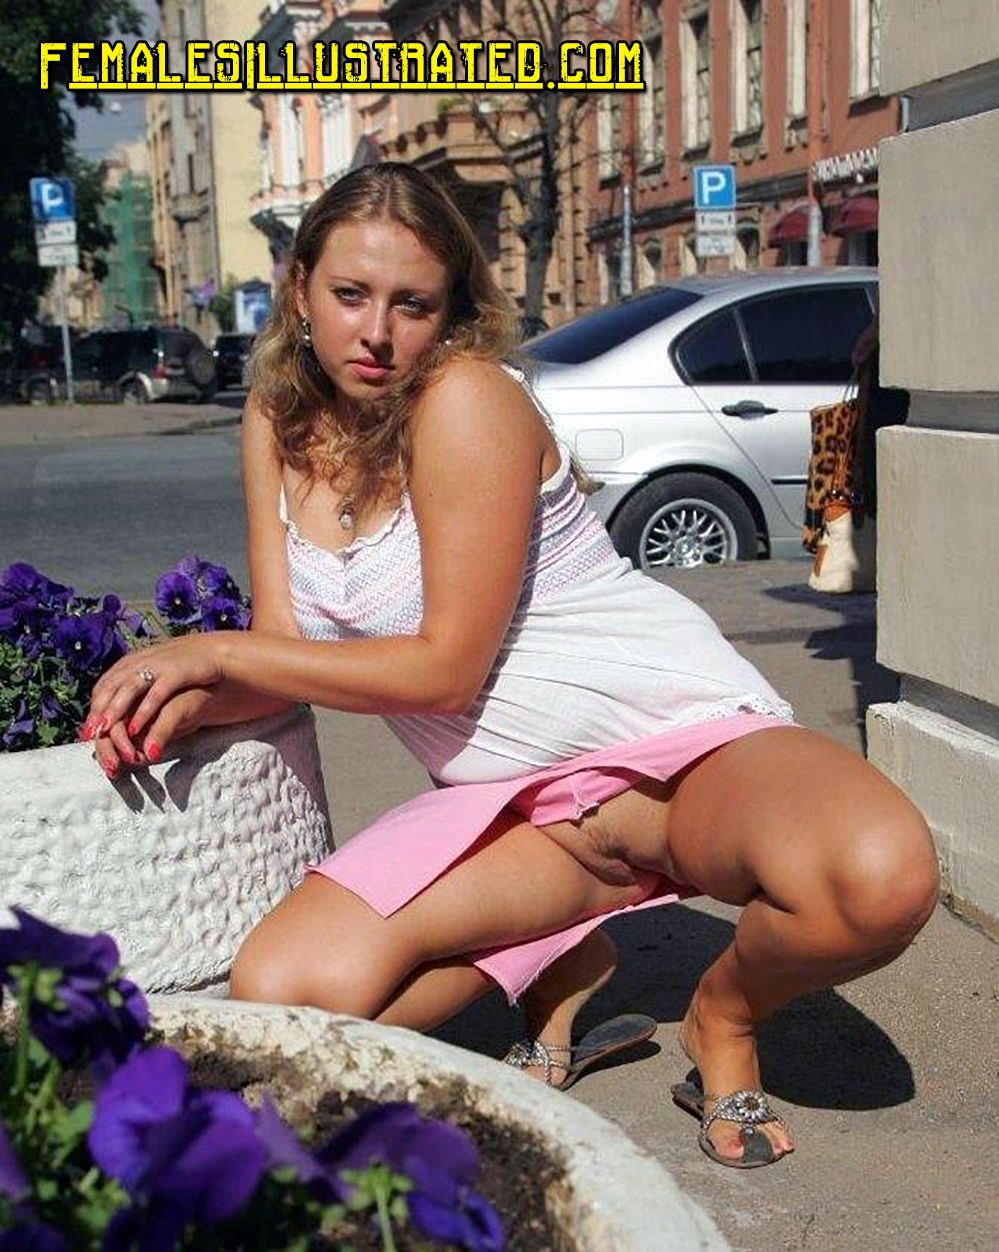 Public pantyless upskirt